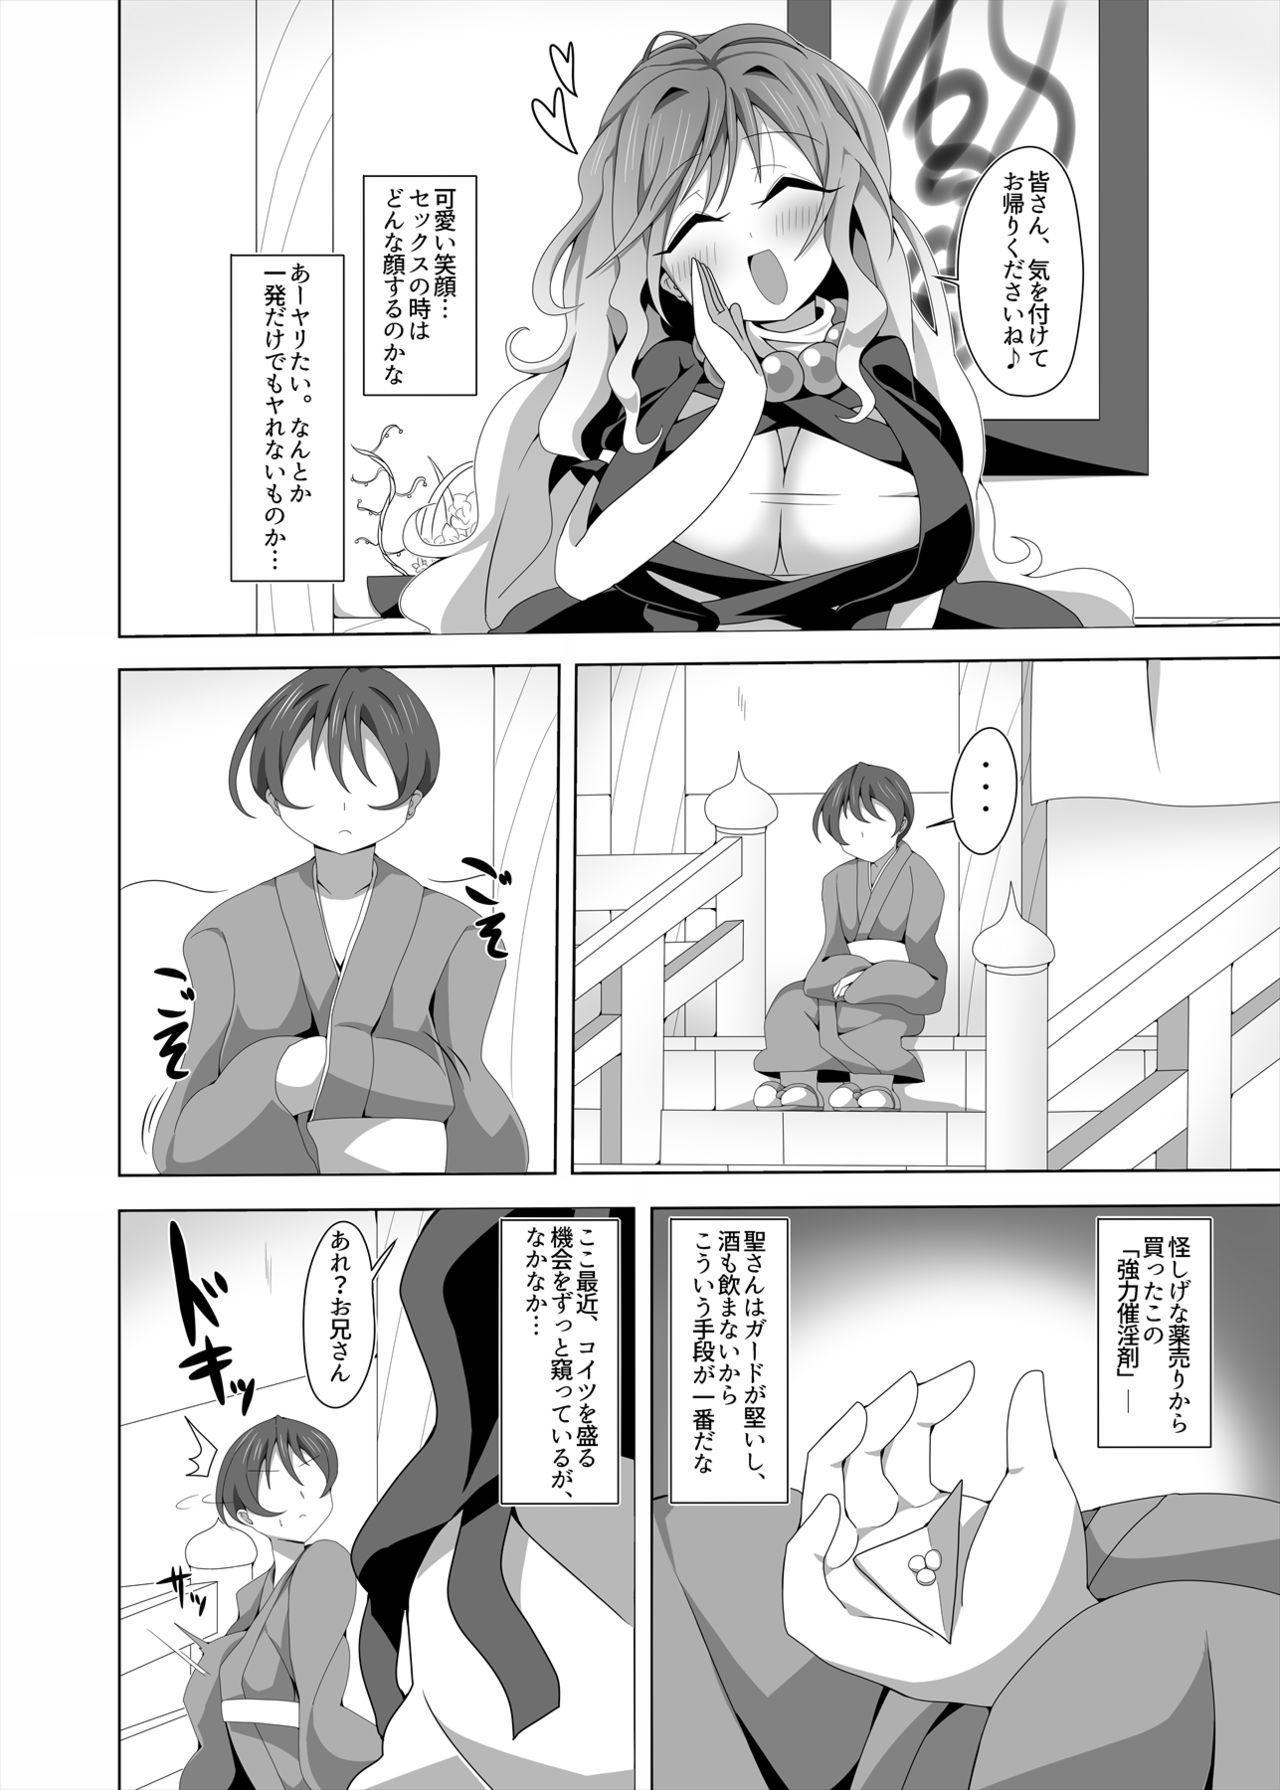 Hijiri-san to Saiinx 2